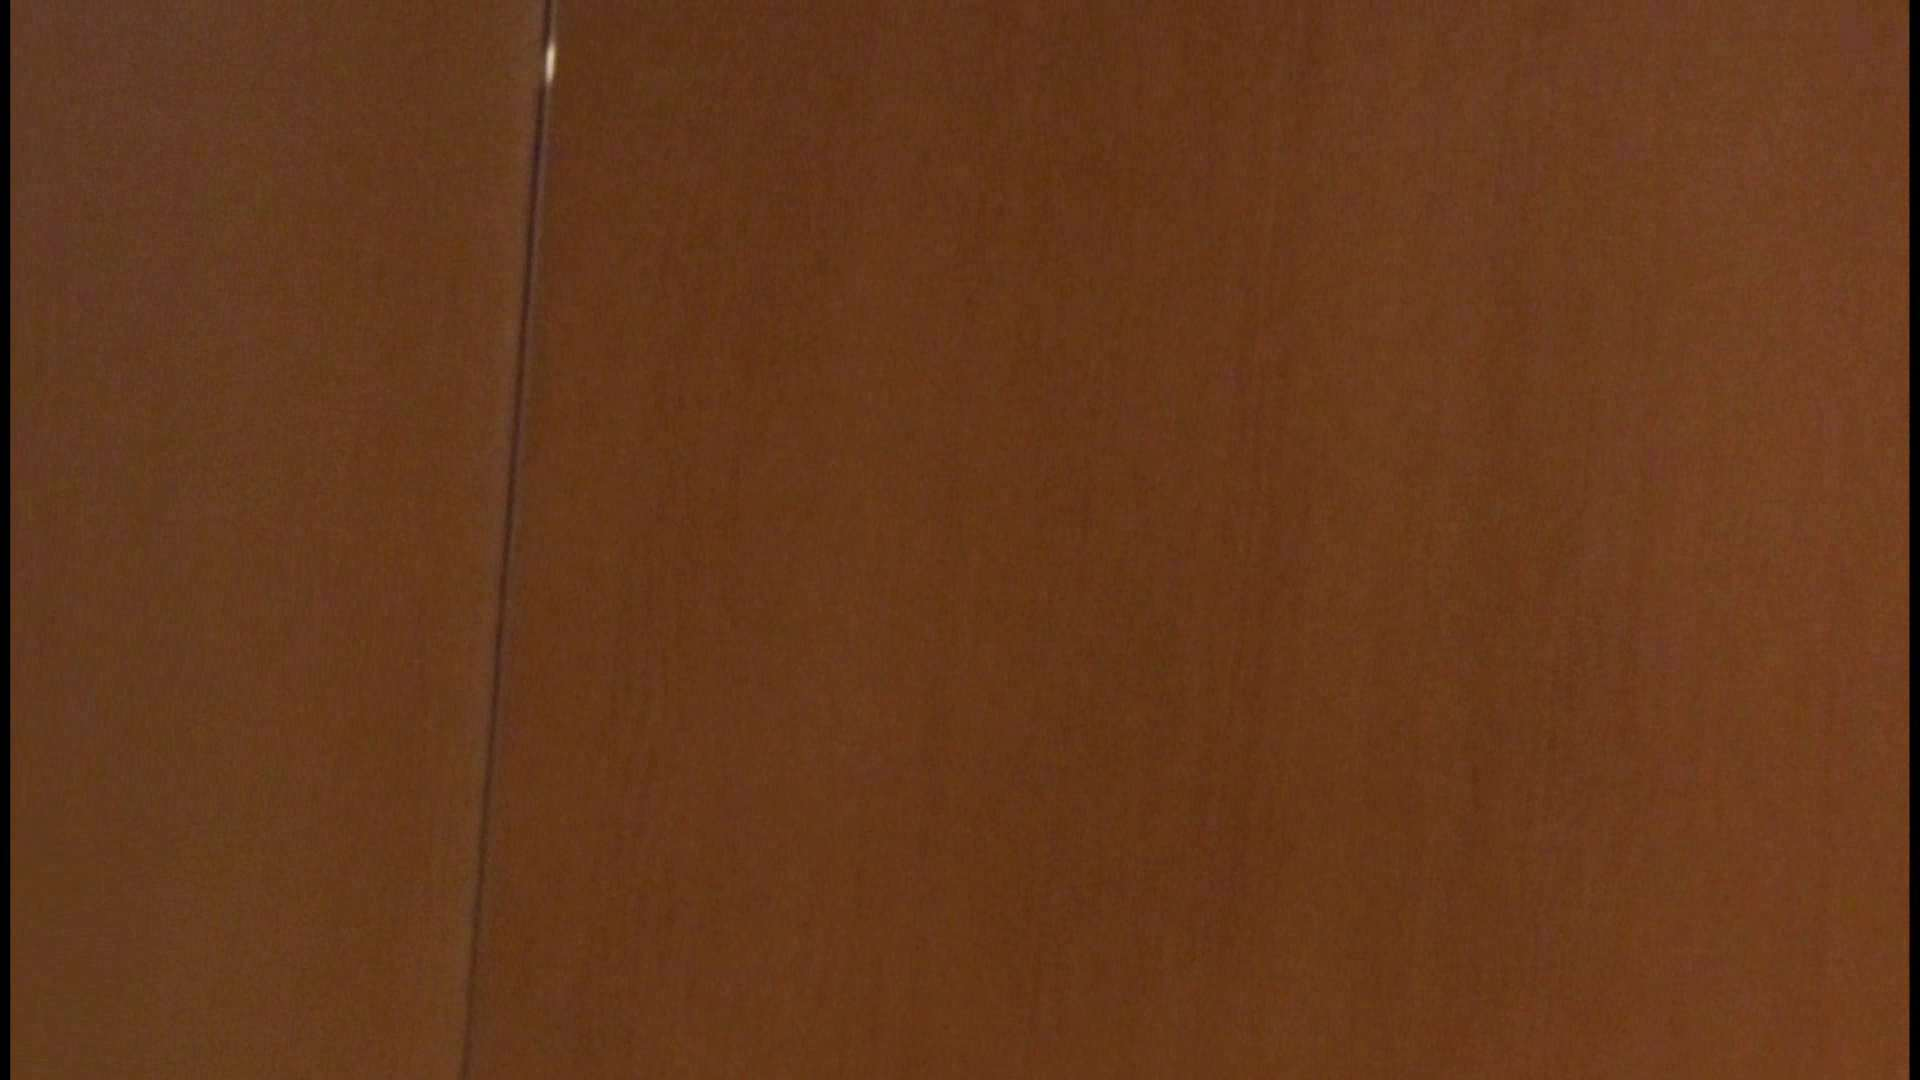 「噂」の国の厠観察日記2 Vol.08 厠  80連発 72